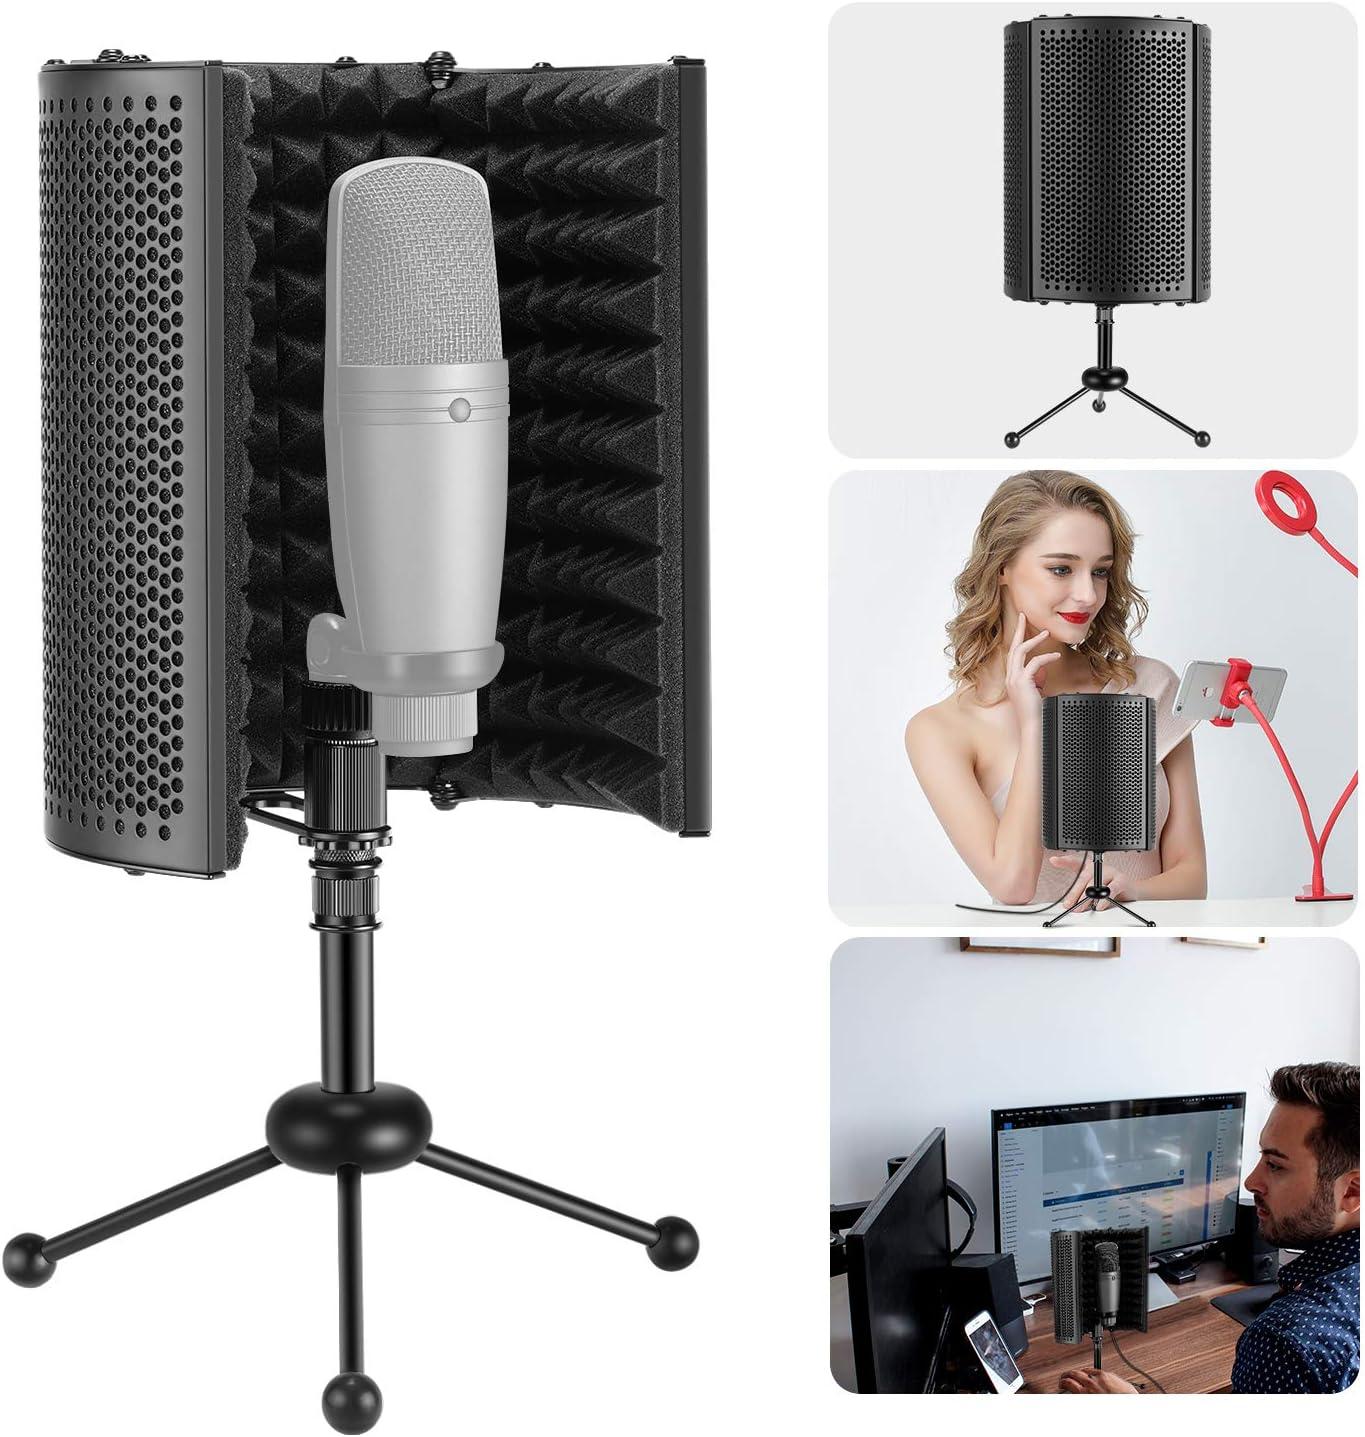 Neewer/® 4 piezas Universal micr/ófono Shock Mount Mikrofonhalter soporte para Radio Broadcasting Studio Voice-over Sound Studio y Recording negro